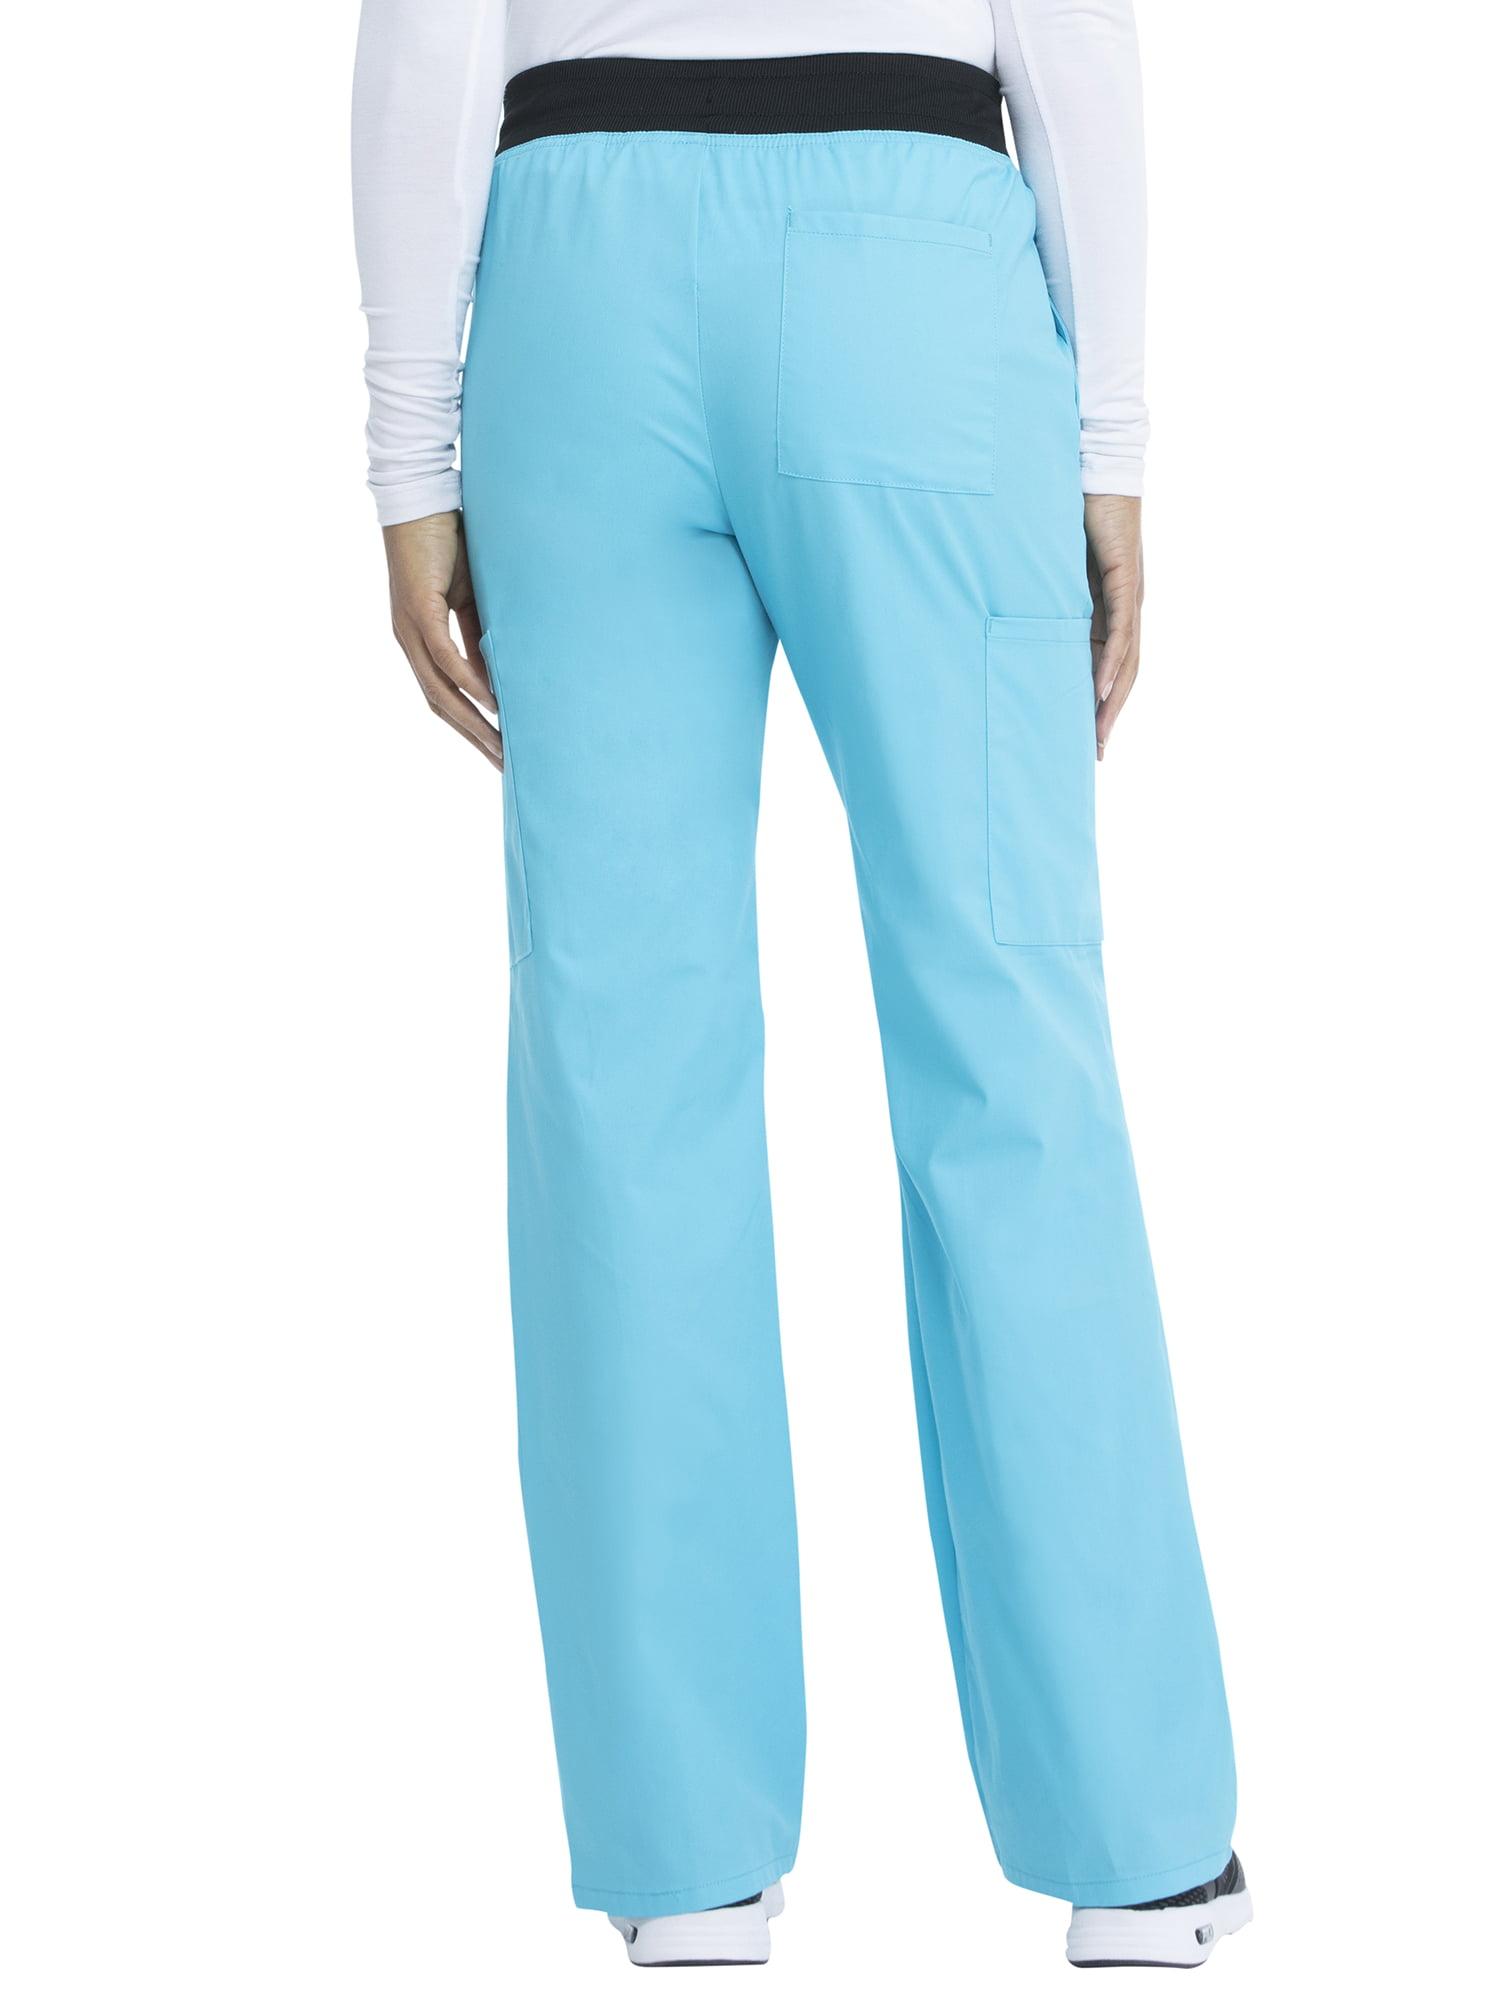 36ff1ee993b Scrubstar - Scrubstar Women's Premium Collection Drawstring Flex Stretch  Scrub Pant - Walmart.com